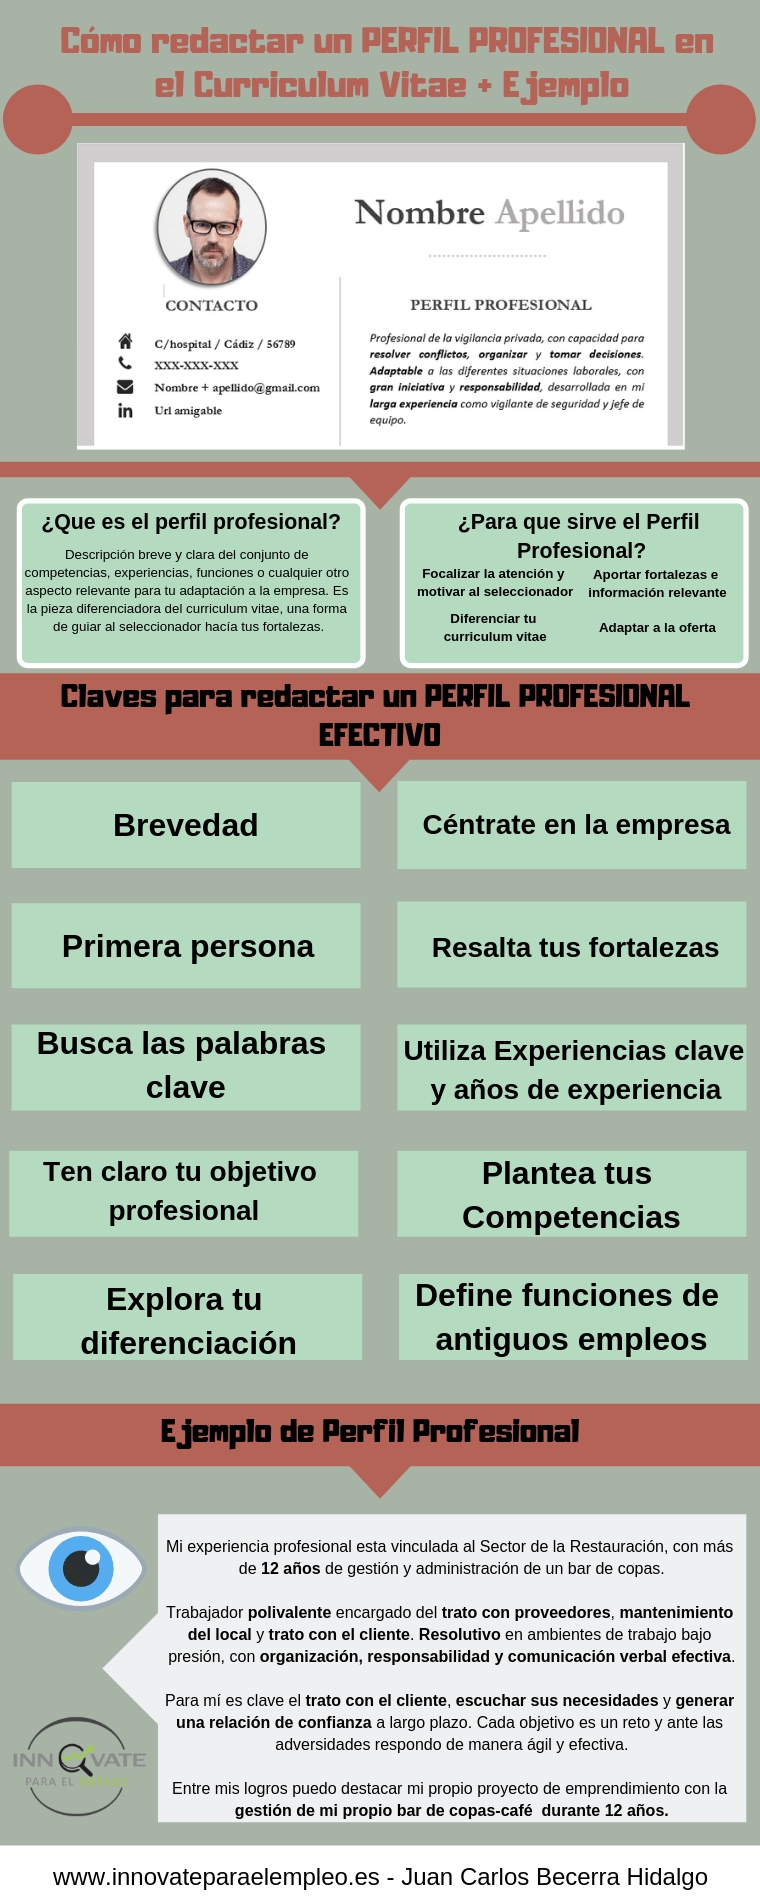 Como Redactar Un Perfil Profesional En El Curriculum Vitae Ejemplos Curriculum Vitae Como Redactar Perfil